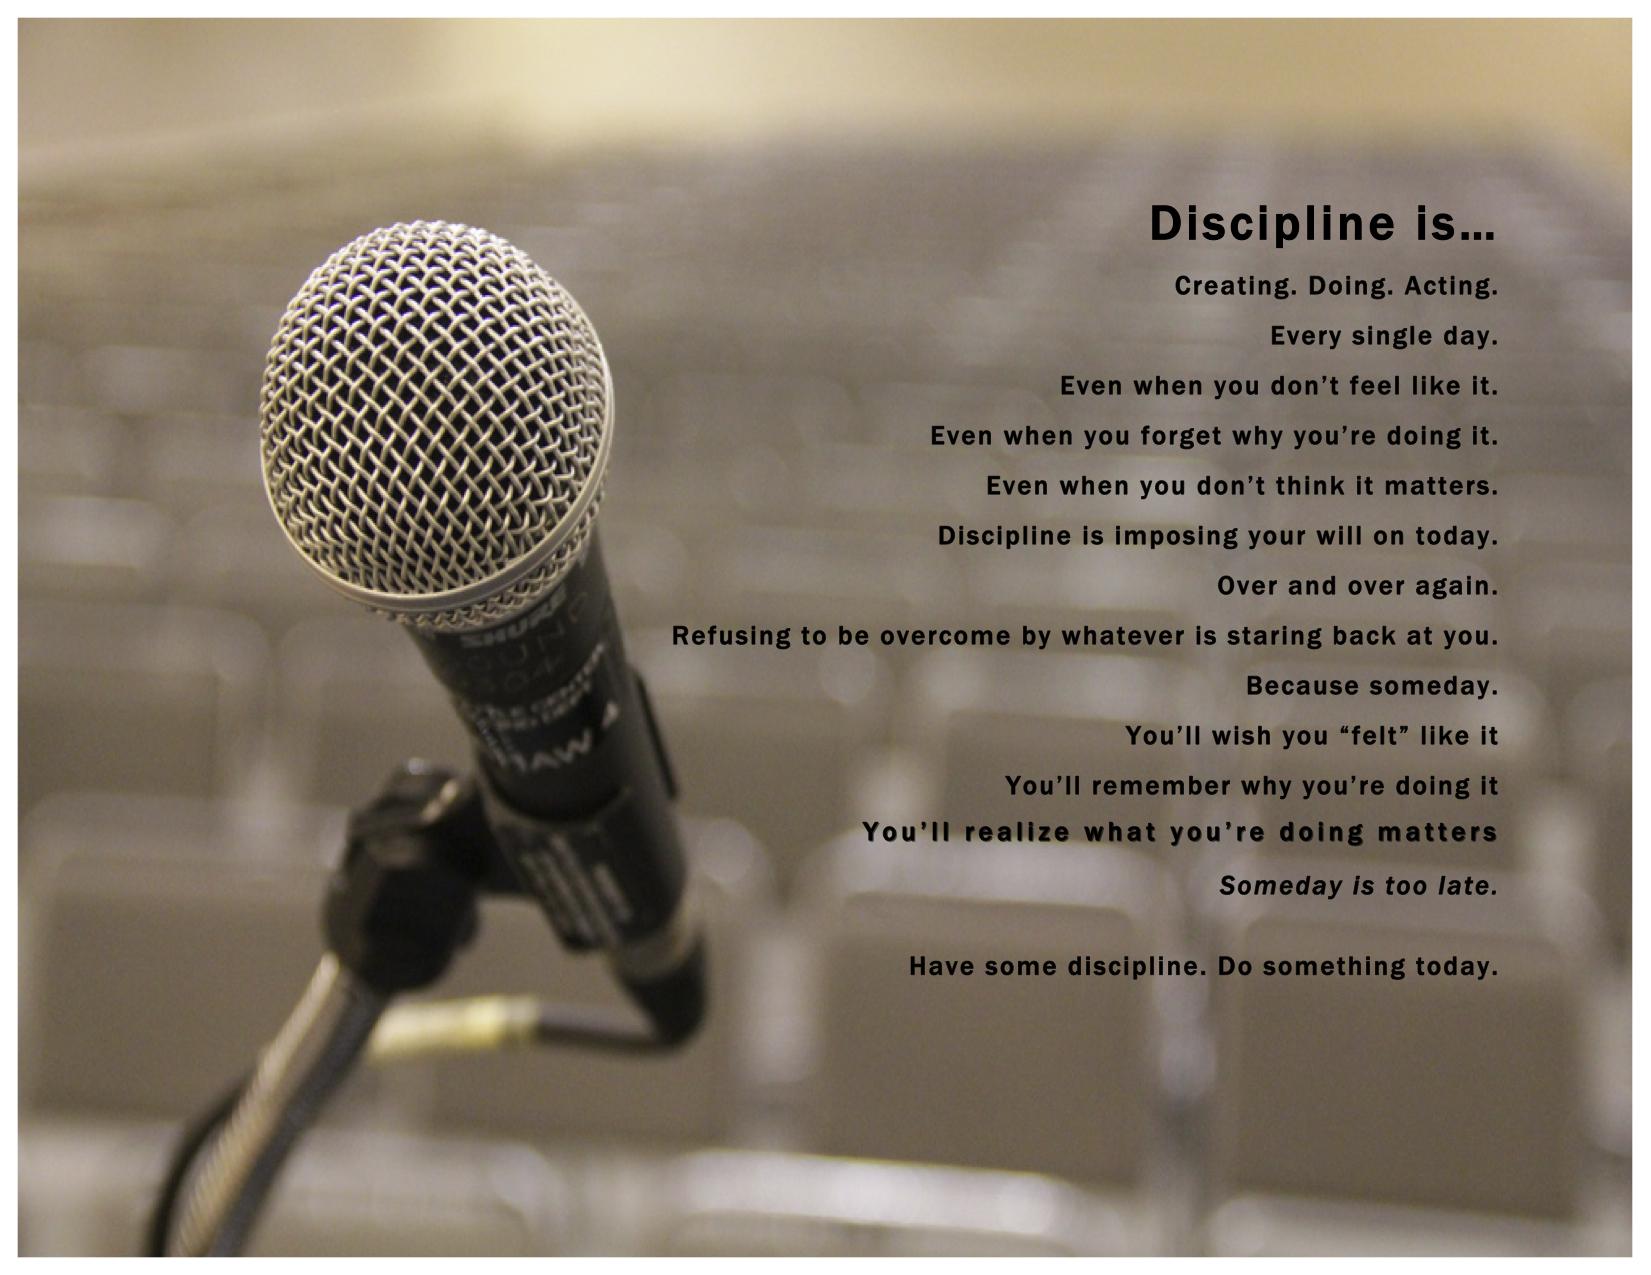 discipline body alleges errors - HD1651×1275